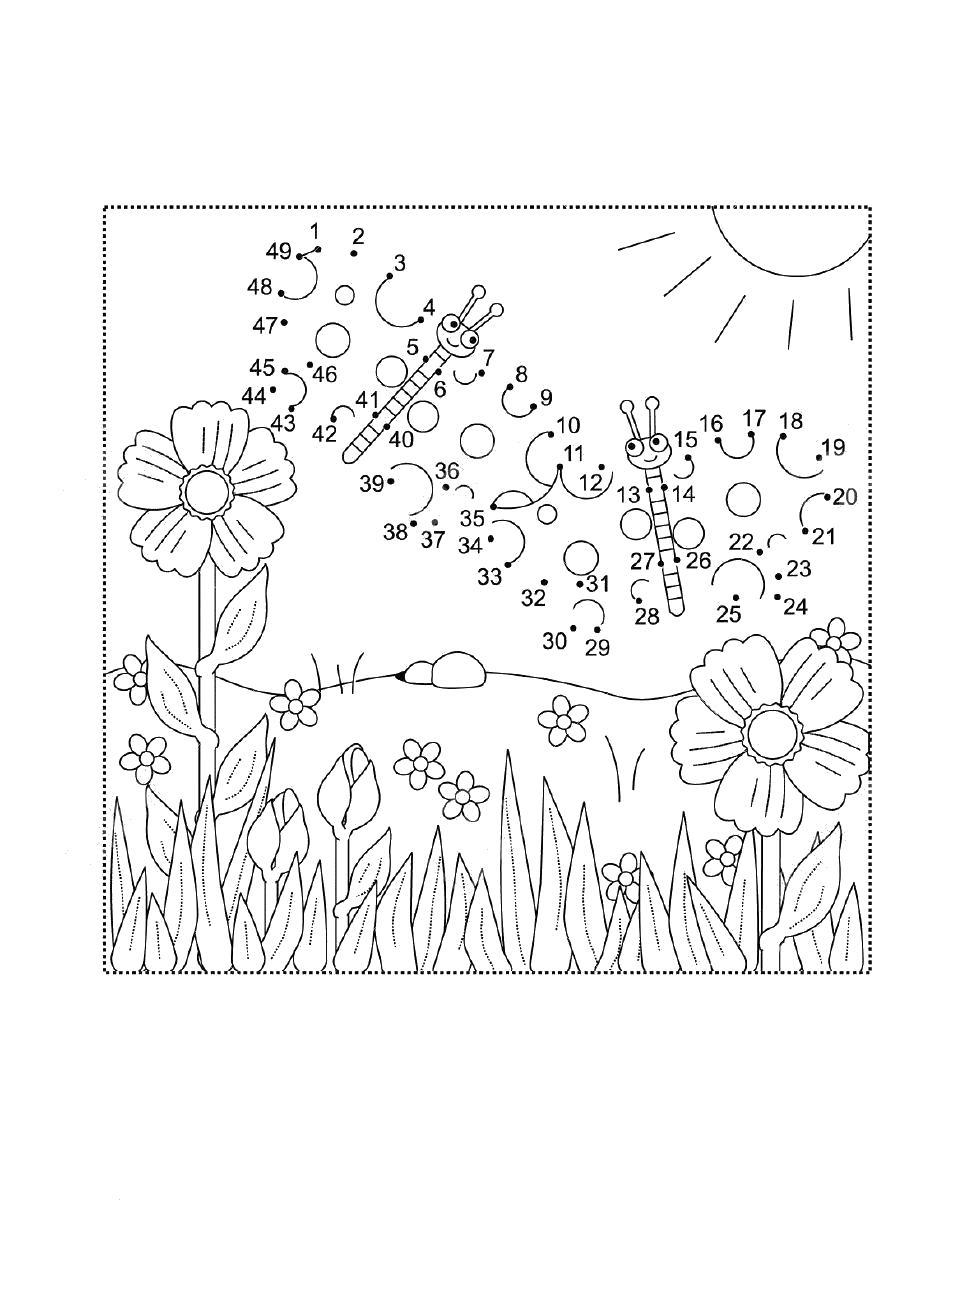 Трава на лужайке с цветами соедини по цифрам и раскрась Разукрашки цветы